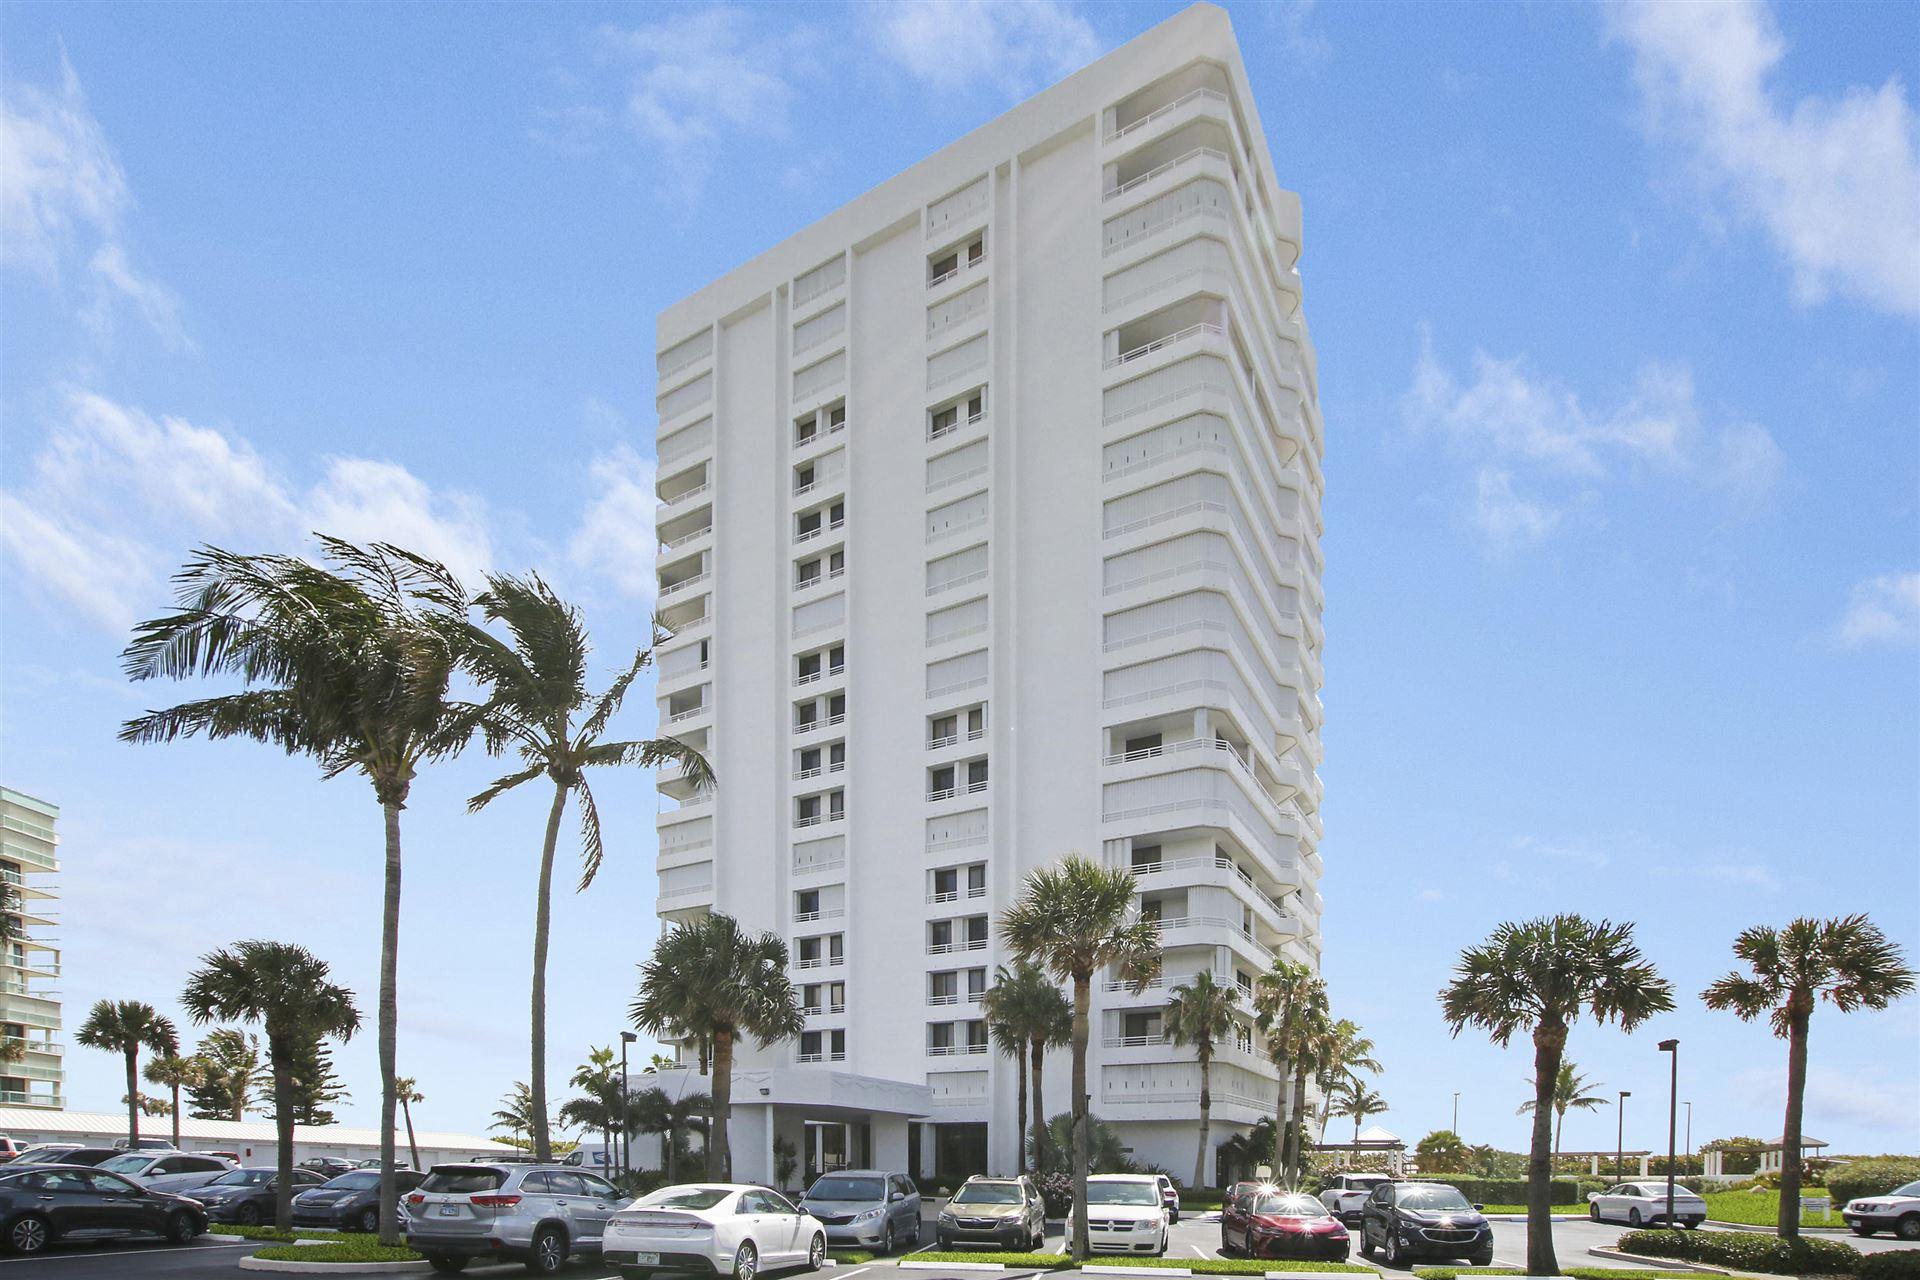 Photo of 9950 S Ocean Drive #301, Jensen Beach, FL 34957 (MLS # RX-10723407)